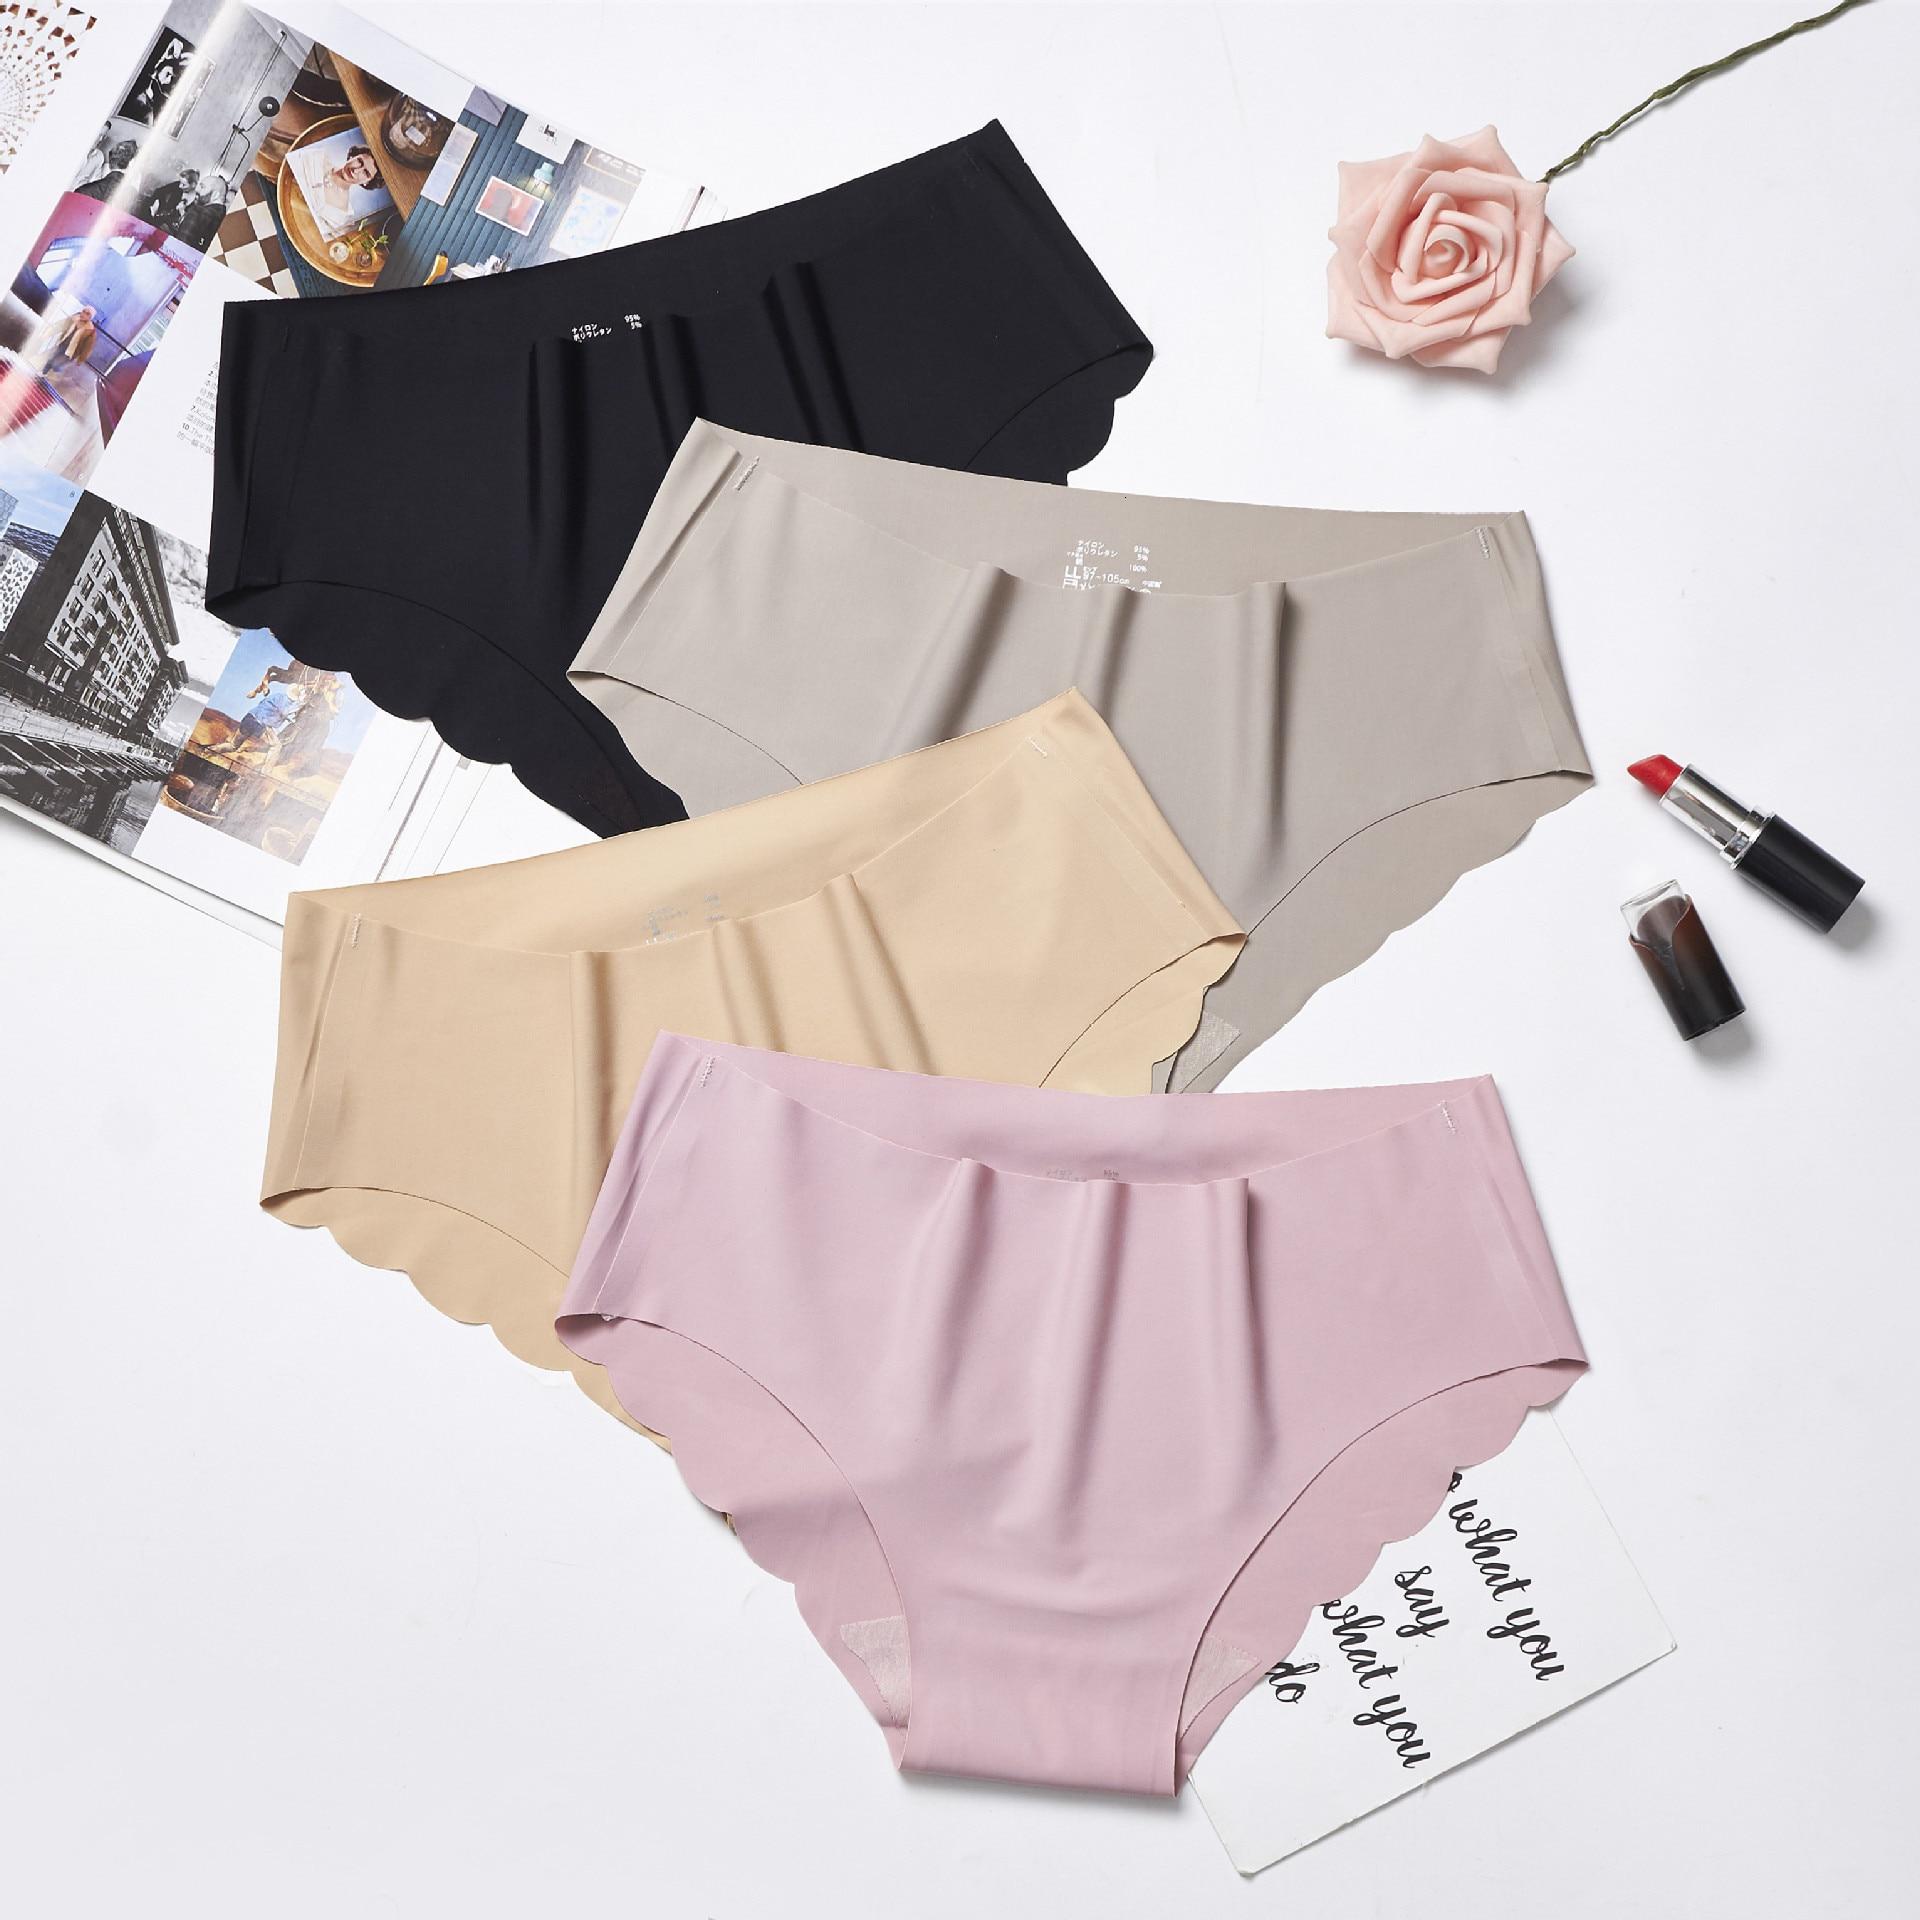 Hot Silk Sexy Women Thongs G String Seamless Panties Female Underwear Tanga Panties Low-Rise Lingerie Panty Intimates 1pcs Ac115